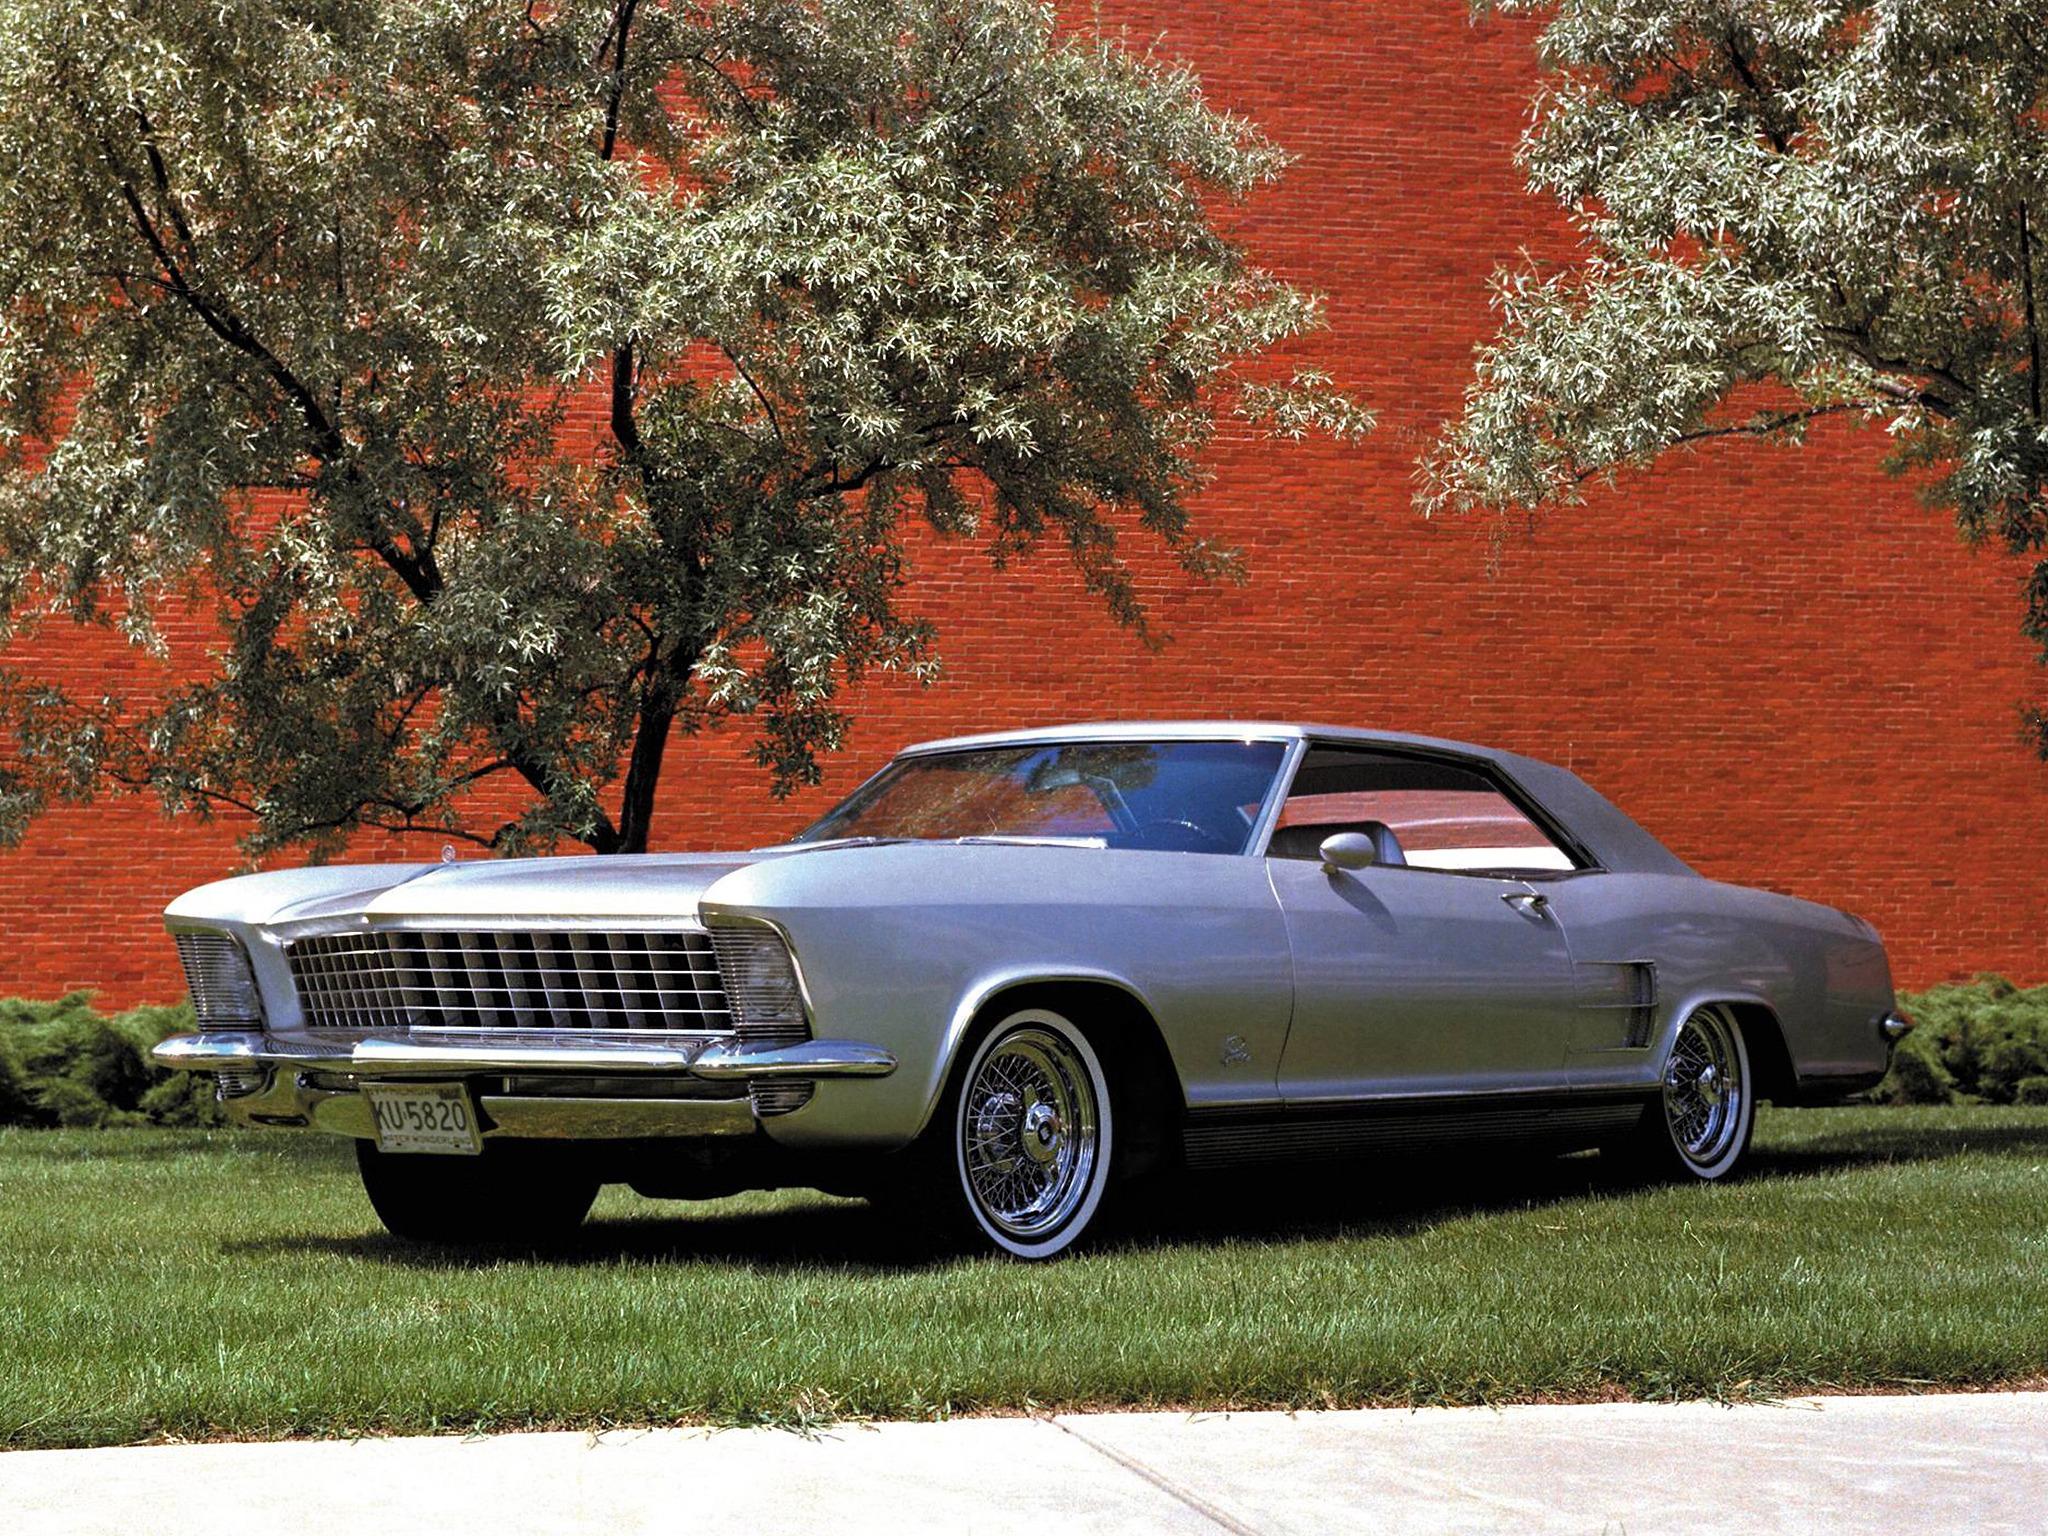 http://oldconceptcars.com/wp-content/uploads/buick_riviera_silver_arrow_concept_car_1.jpg